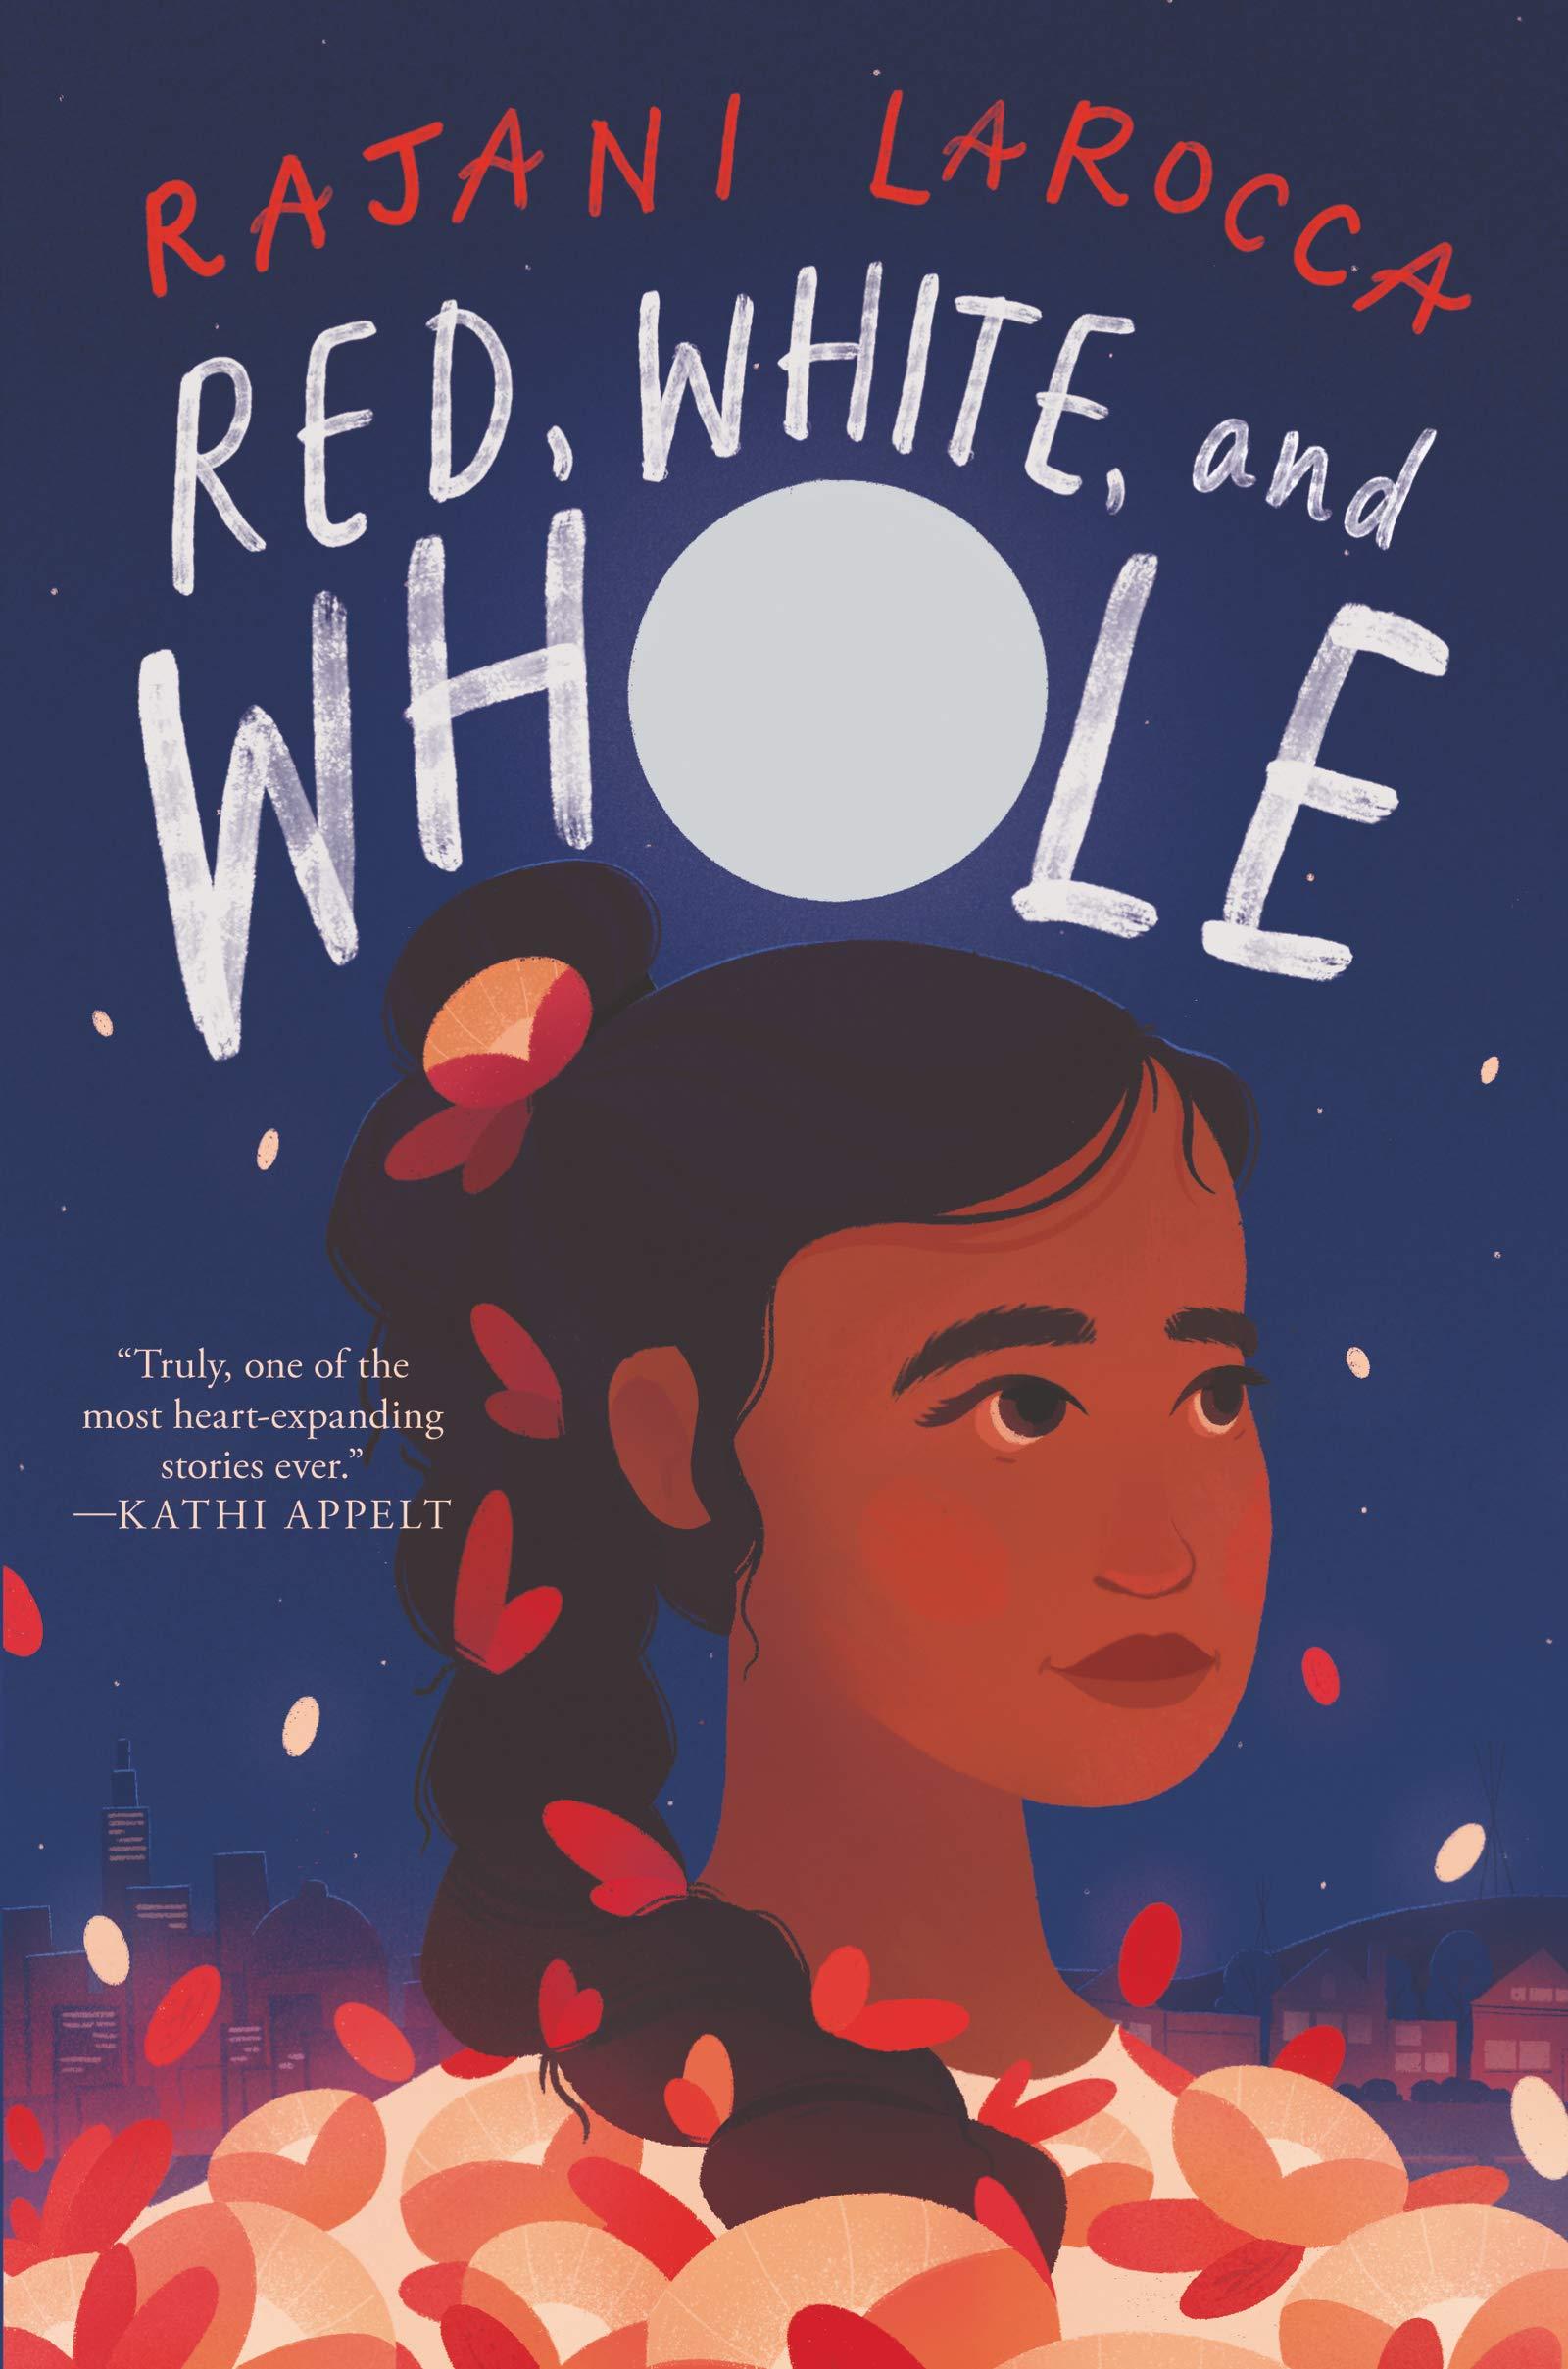 Amazon.com: Red, White, and Whole: 9780063047426: LaRocca, Rajani: Books